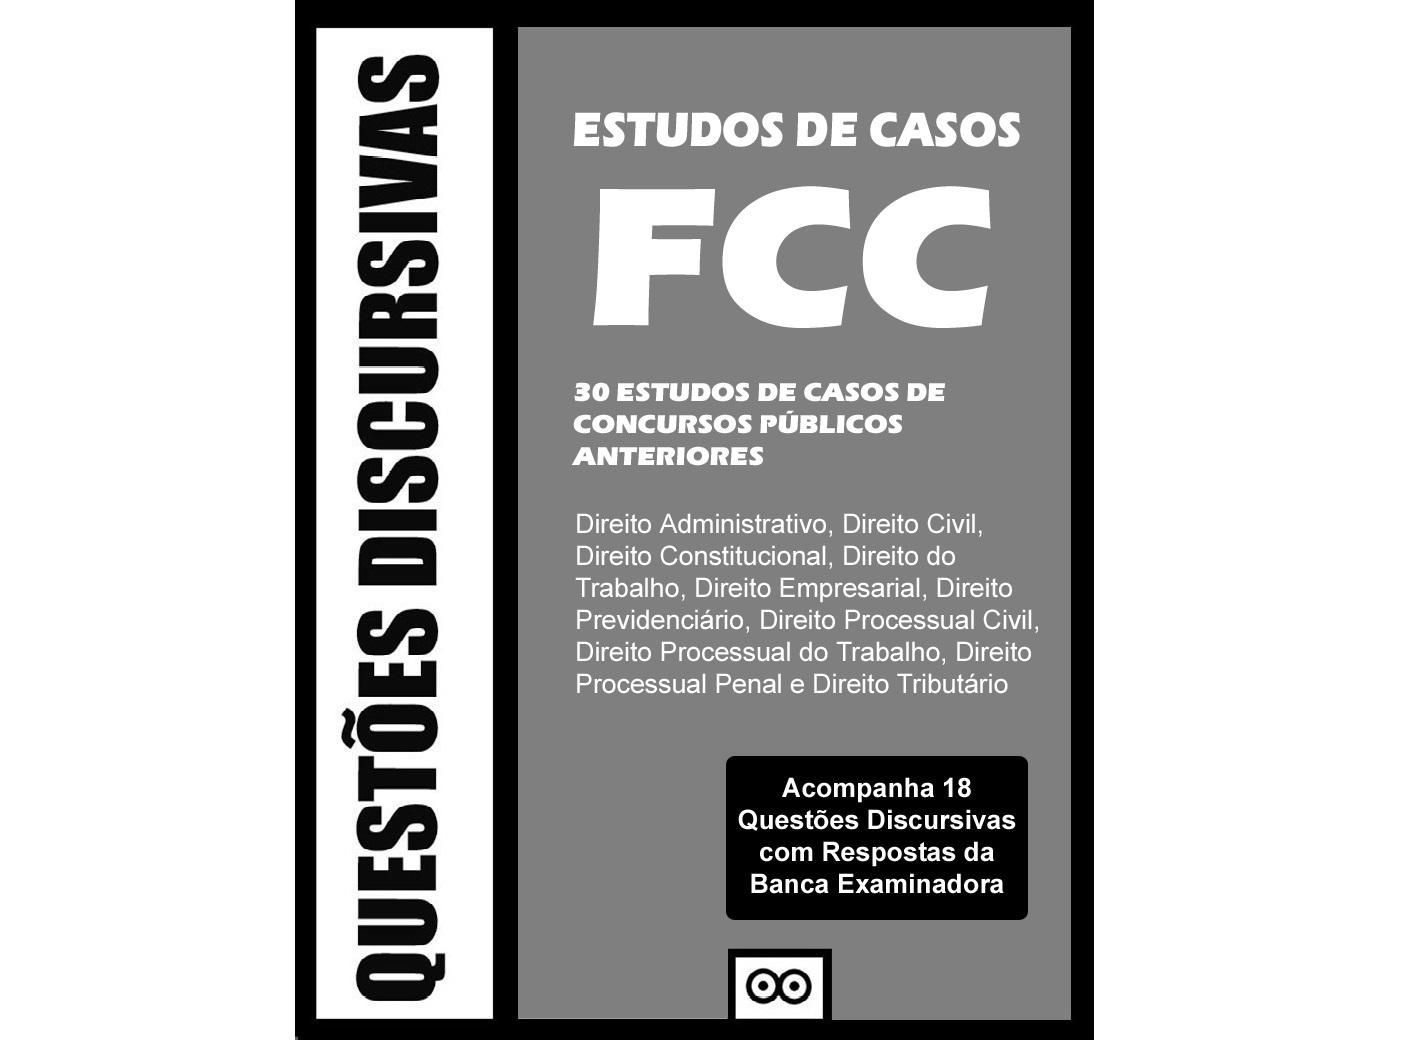 capa-estudo-de-caso-fcc.jpg